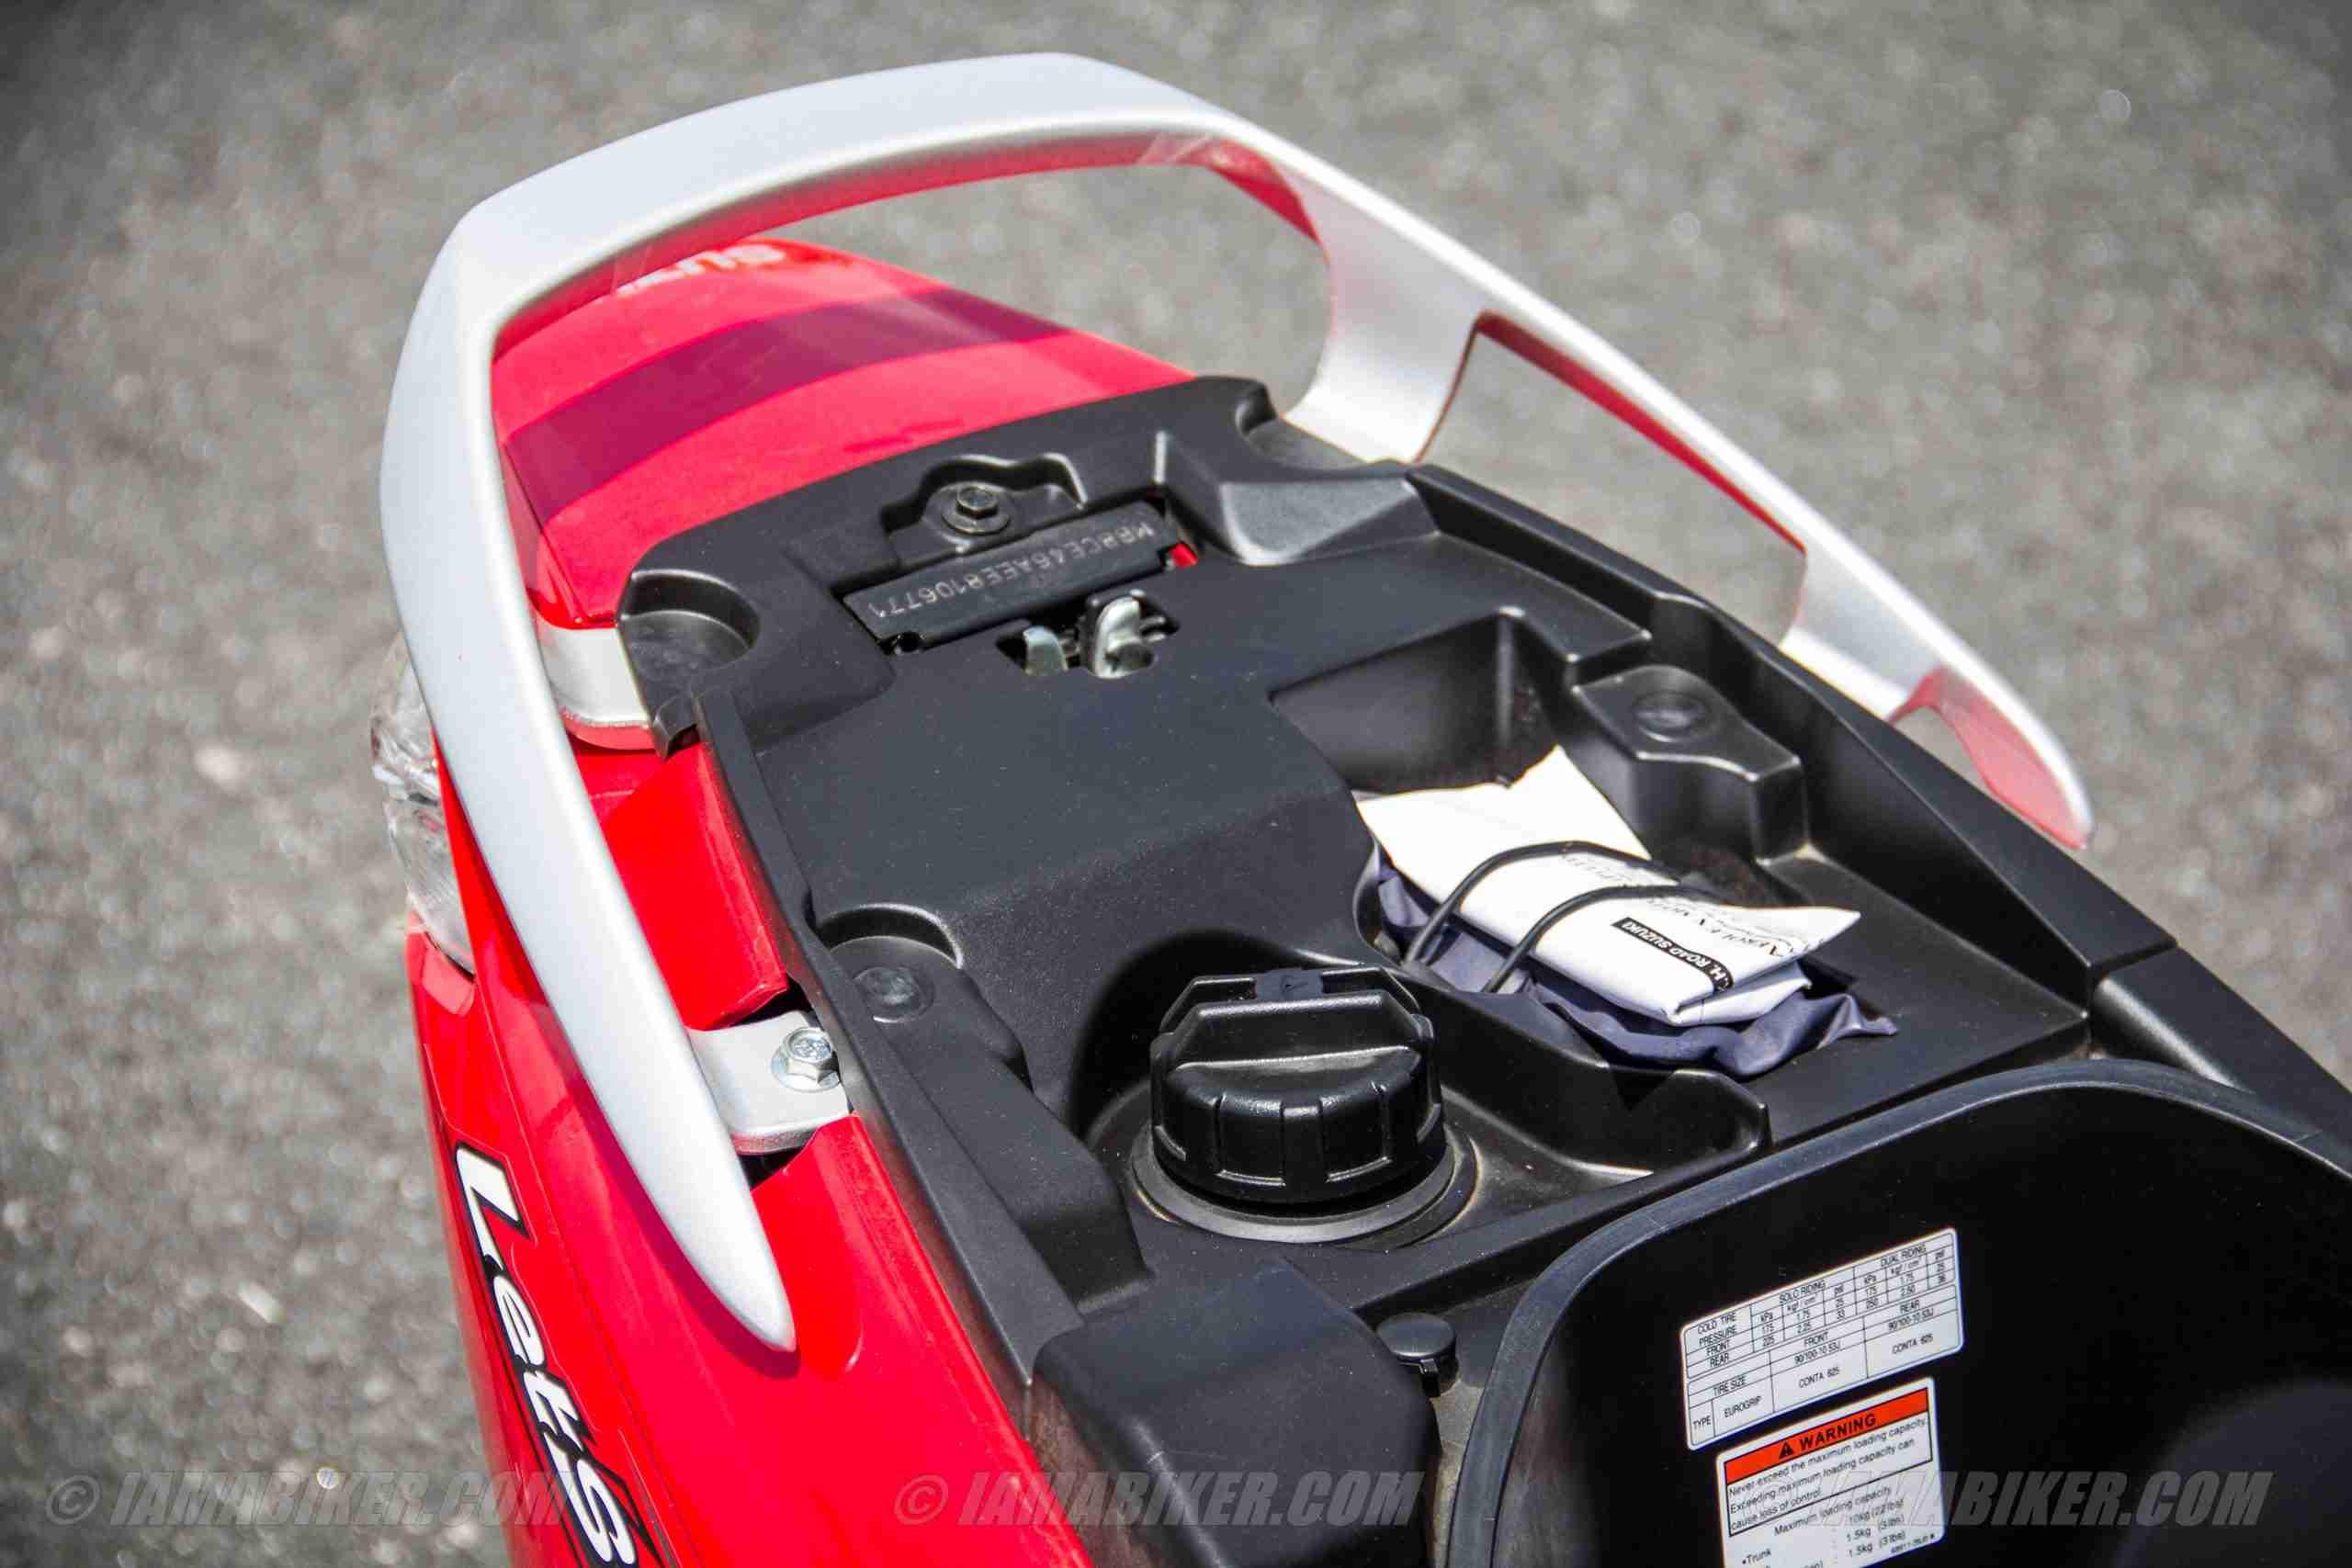 Suzuki Lets scooter petrol tank cap